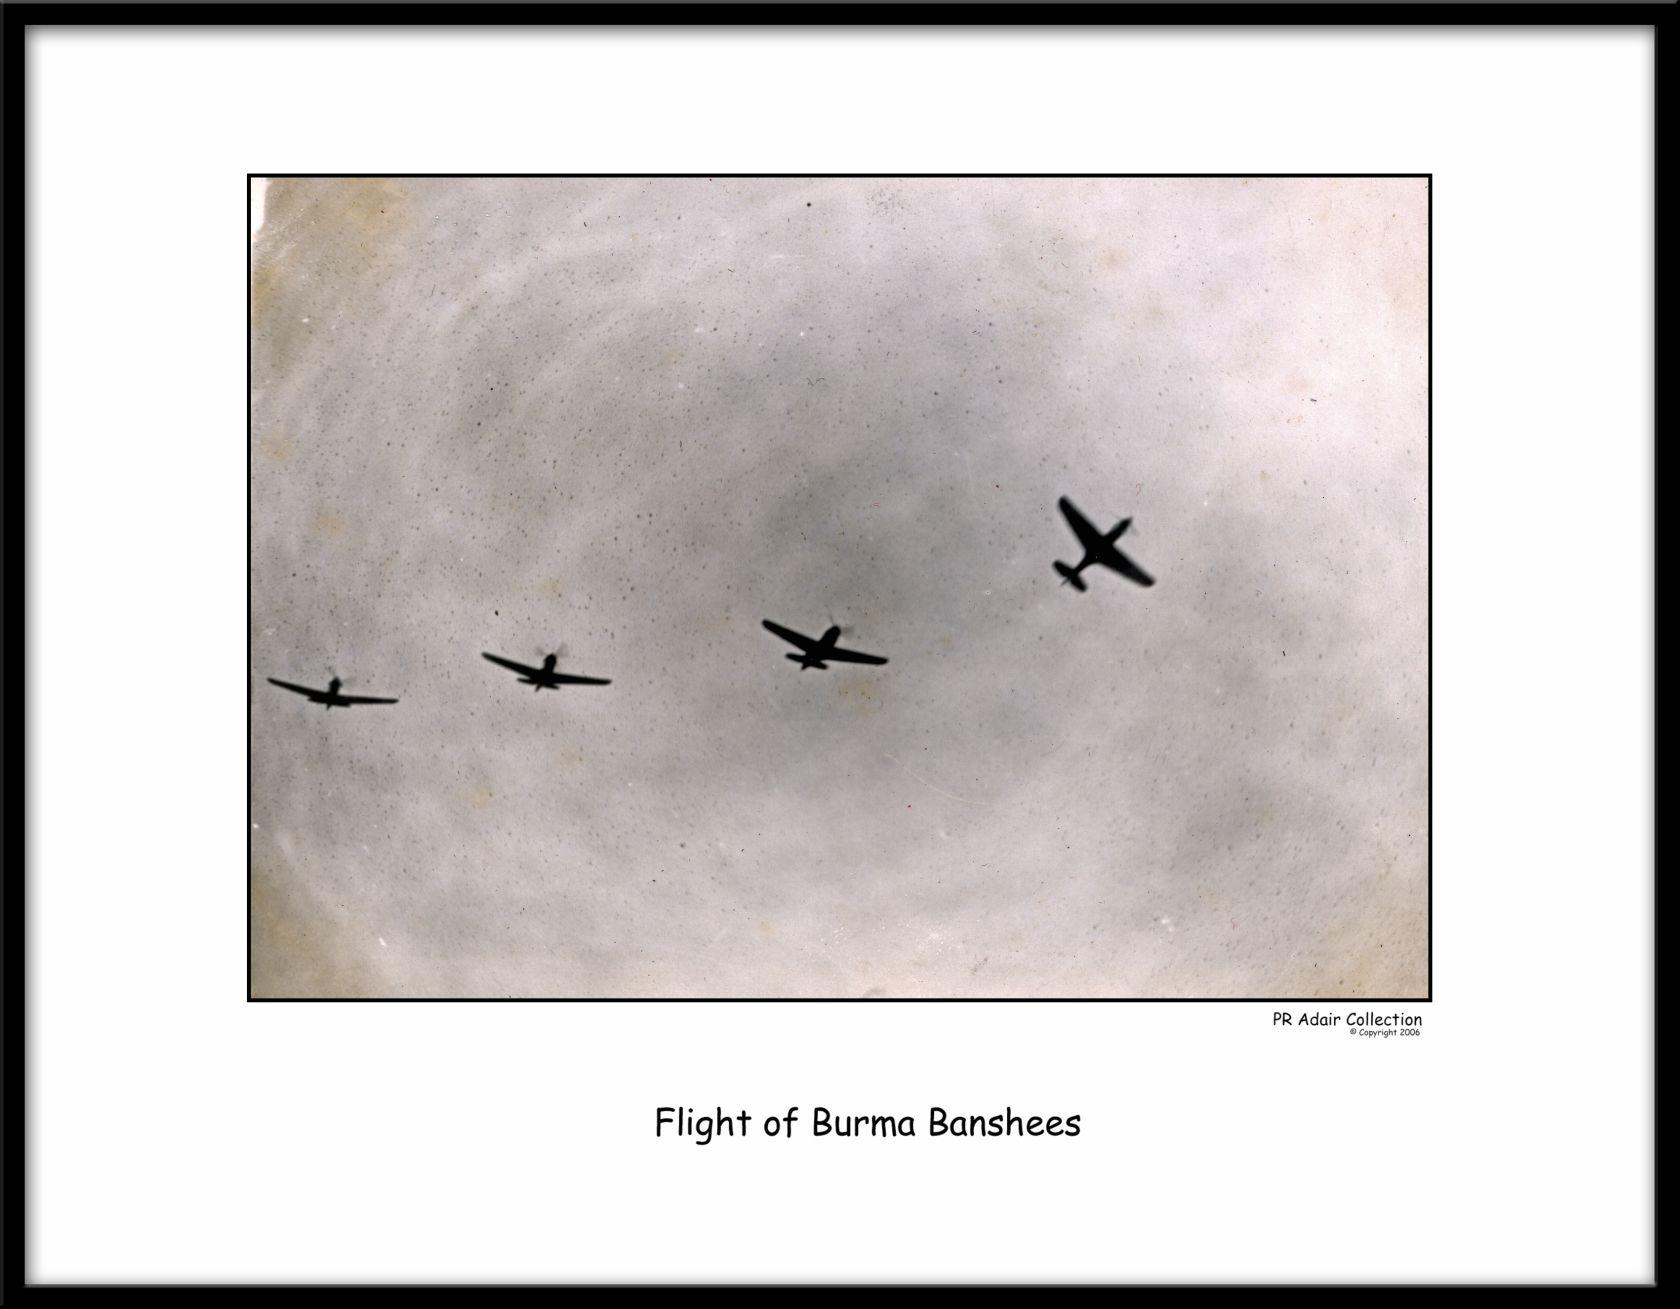 Burma Banshee 110